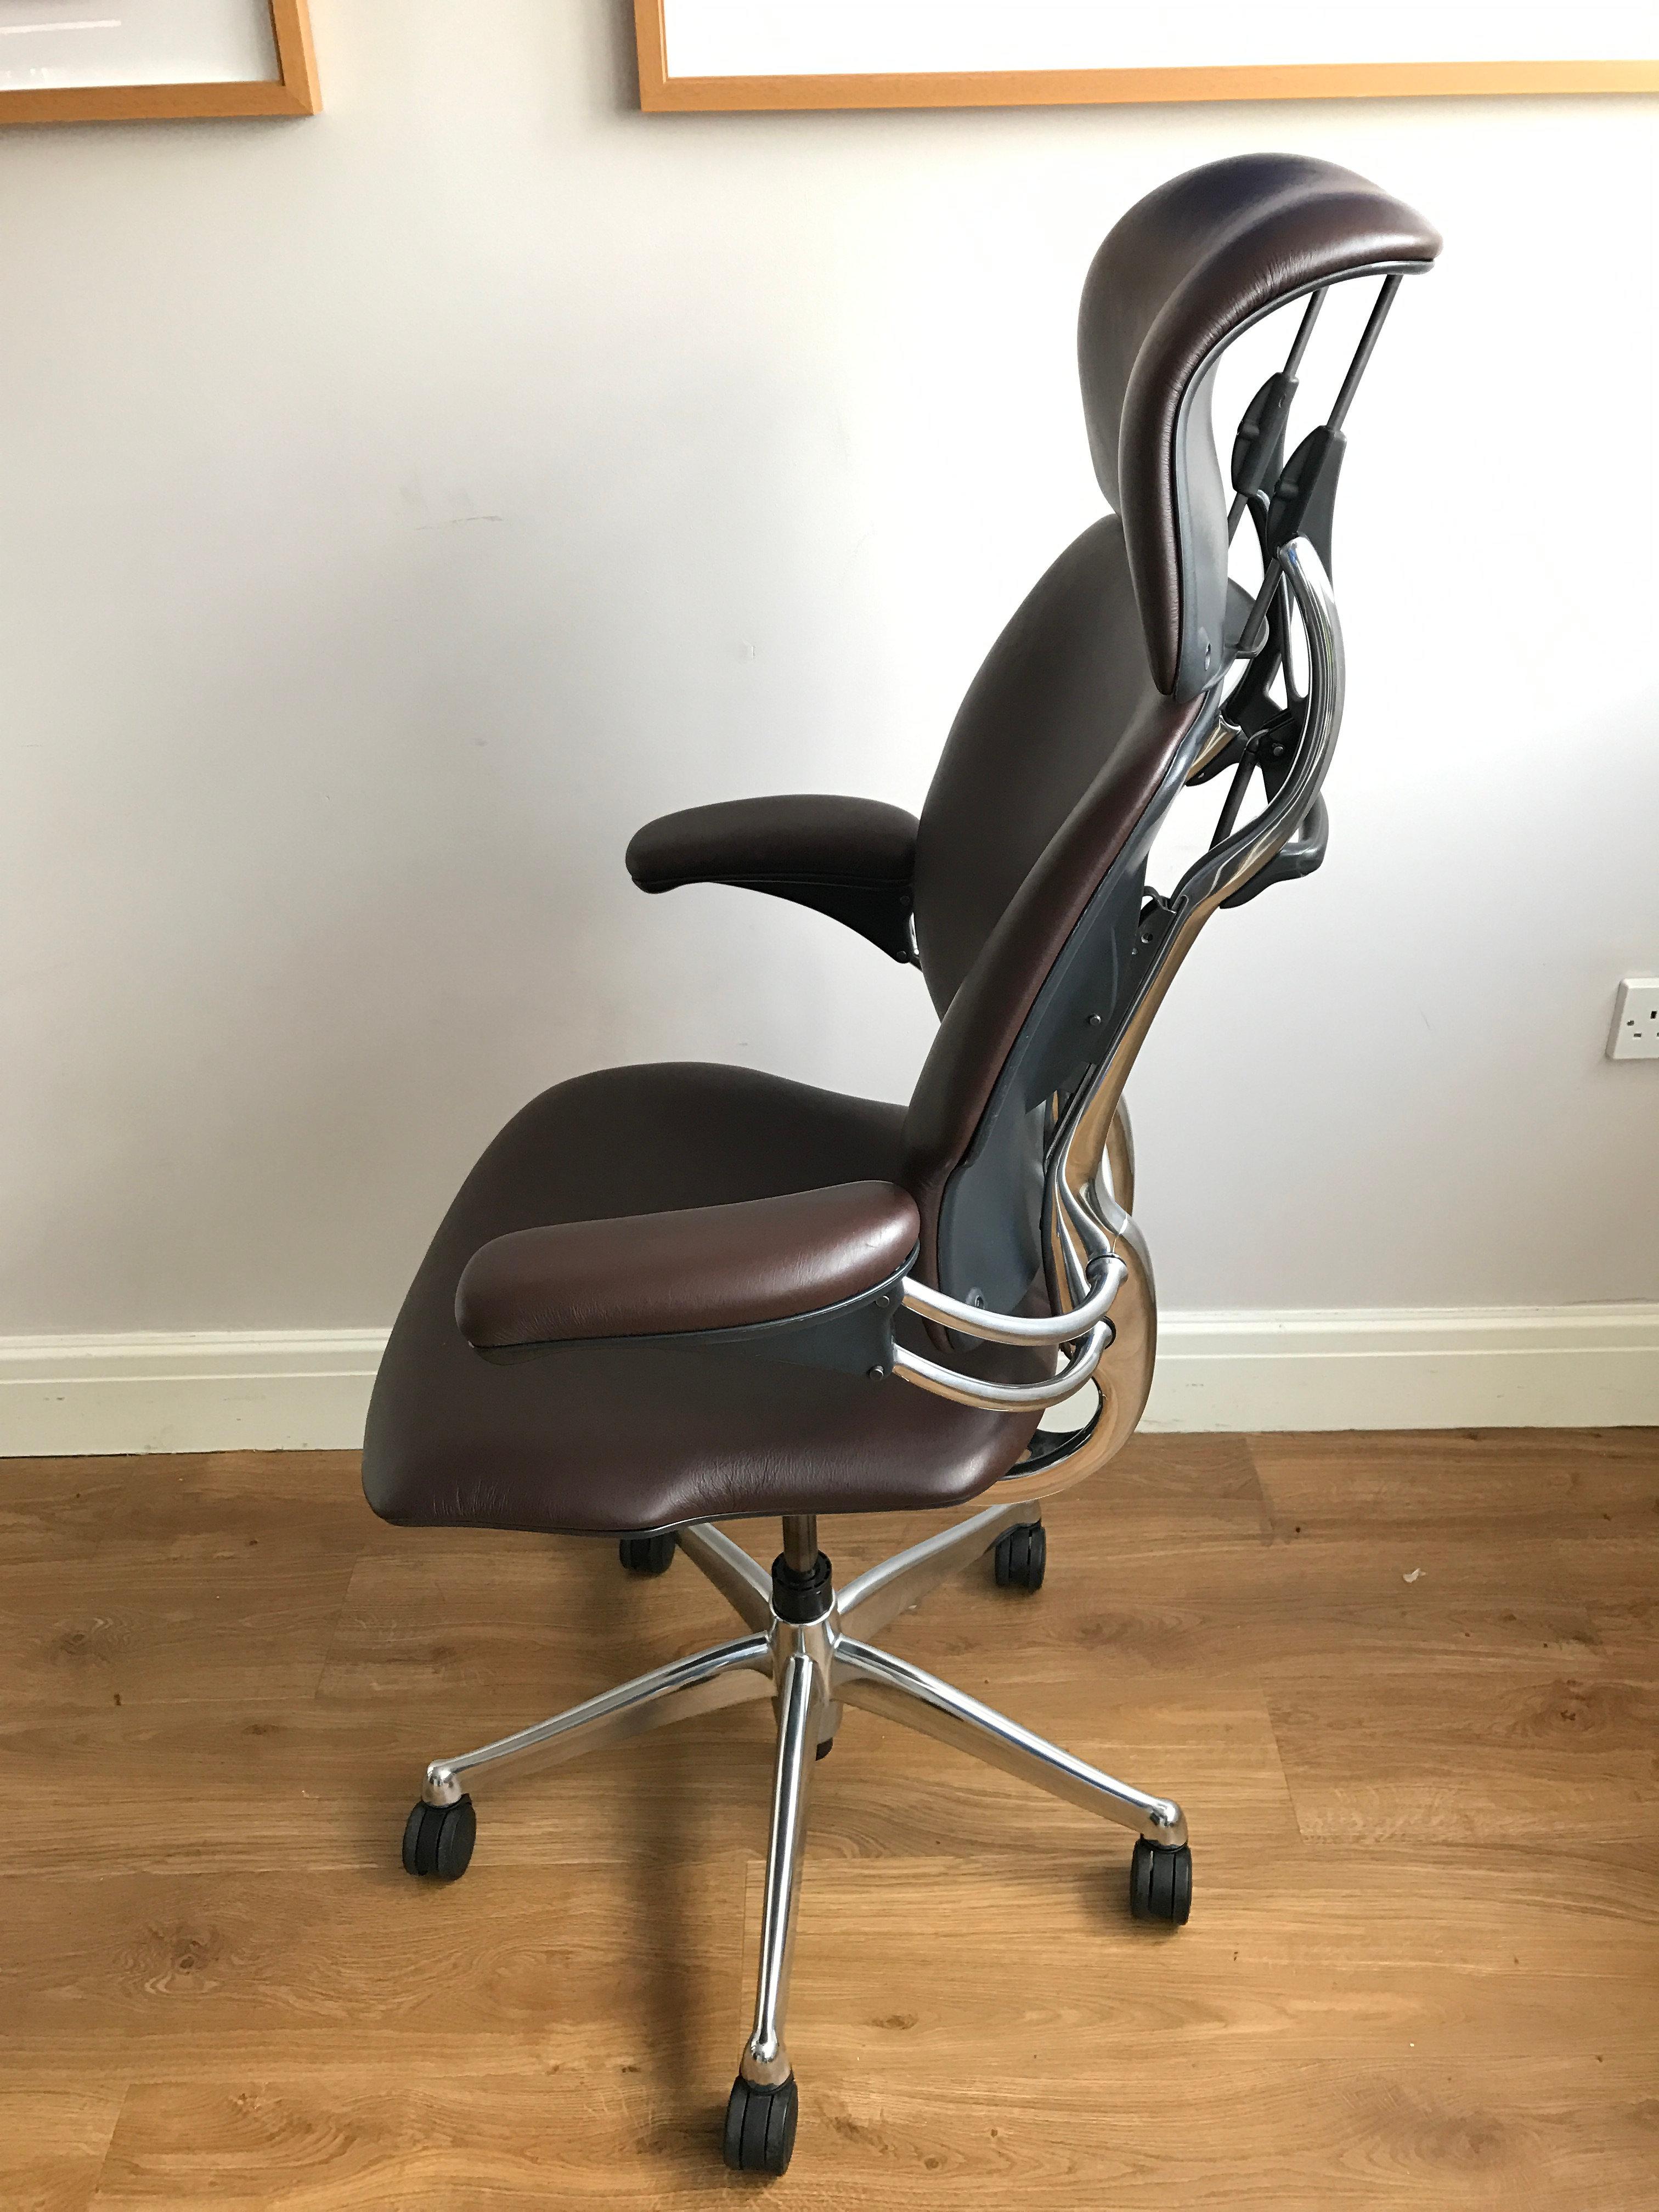 wilson sample studies chairs chair bolles freedom sedus